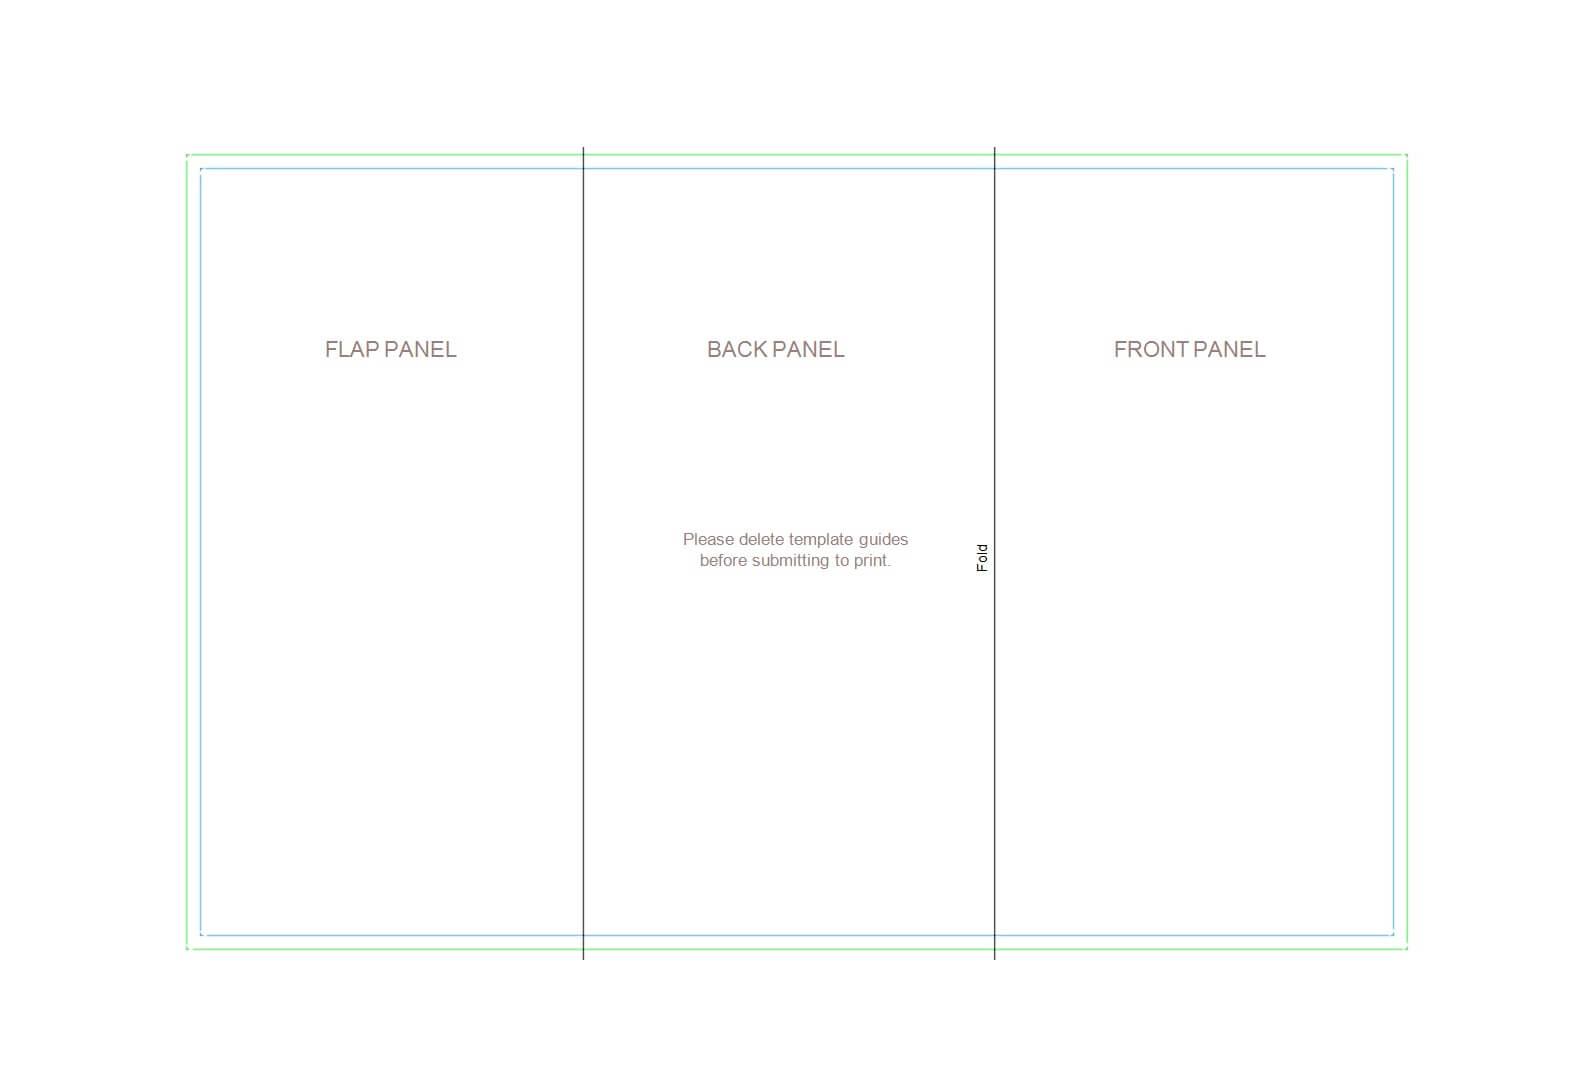 50 Free Pamphlet Templates [Word / Google Docs] ᐅ Template Lab Inside Google Docs Tri Fold Brochure Template